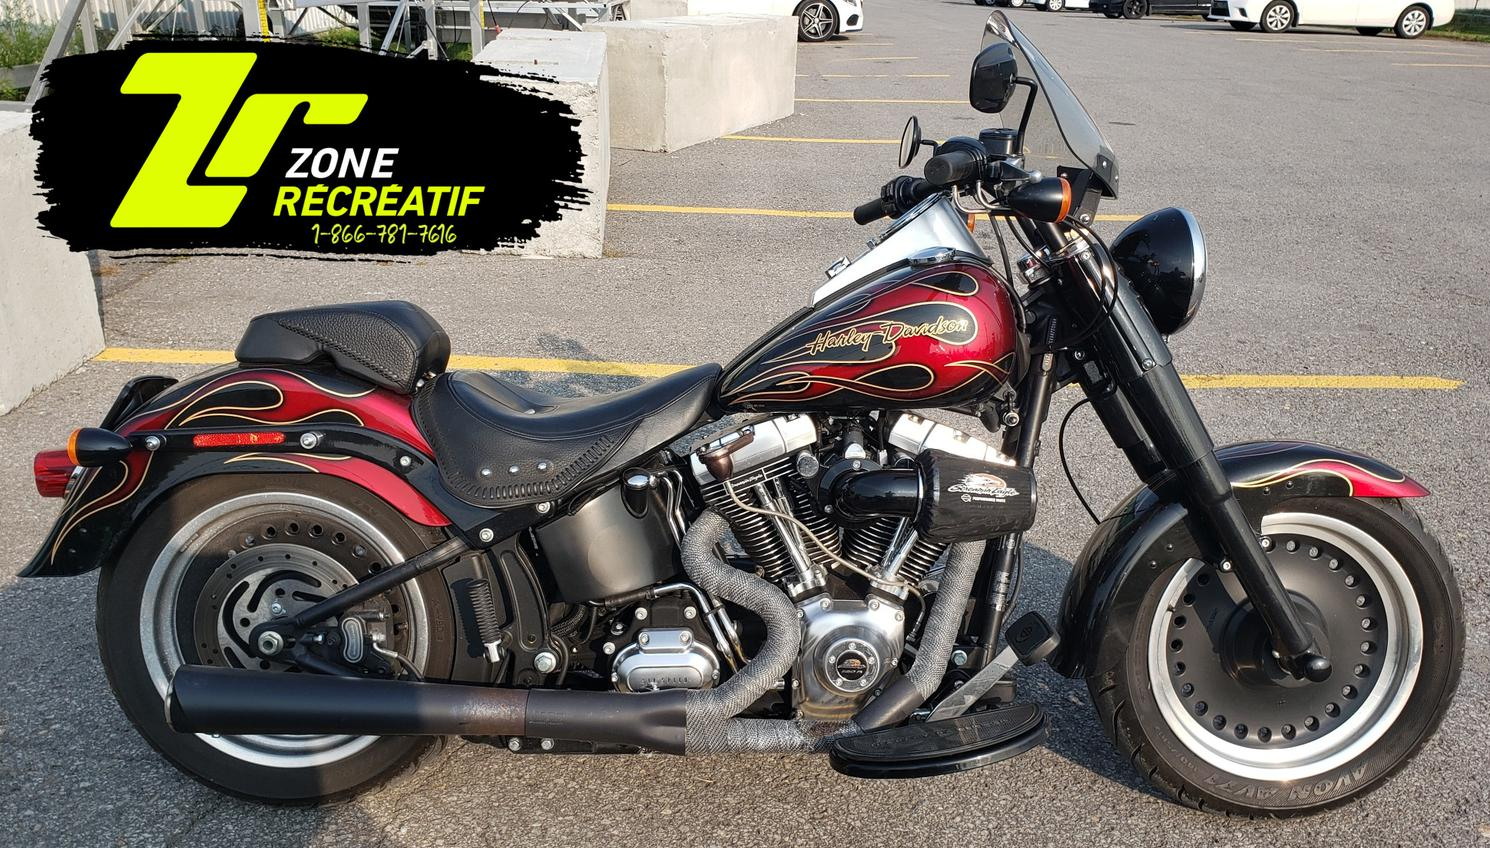 2014 Harley-Davidson FLSTF 120R - Fat Boy